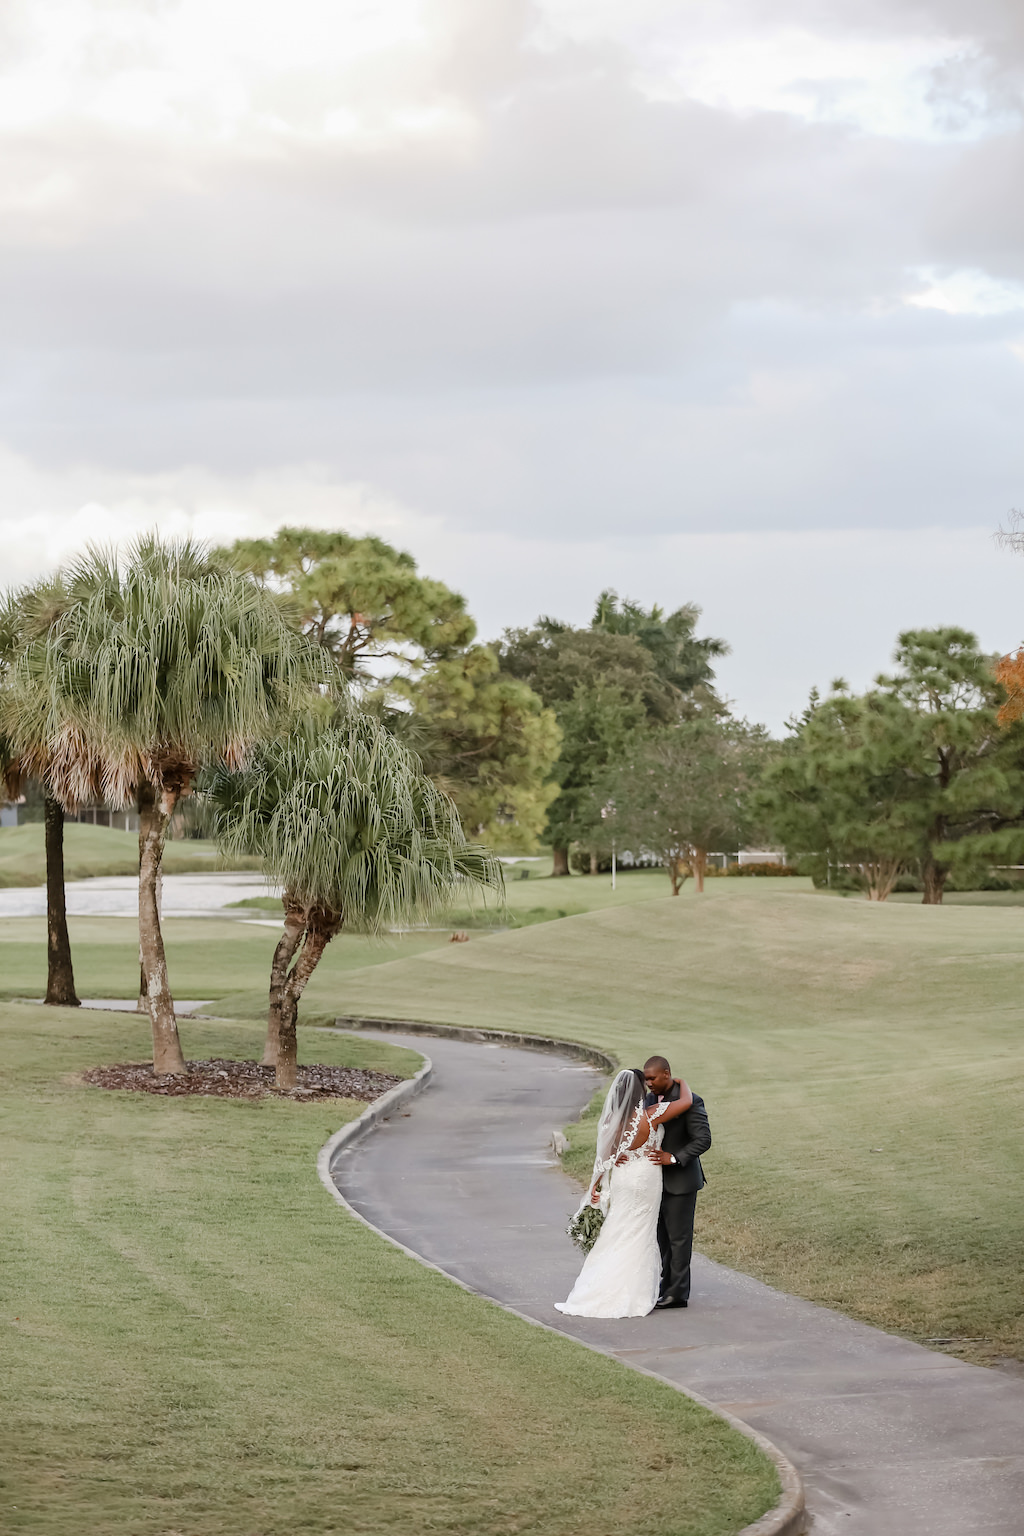 Outdoor Golf Course Bride and Groom Wedding Portrait | Tampa Bay Golf Course Wedding Venue The Bayou Club | Tampa Wedding Photographer Lifelong Photography Studio